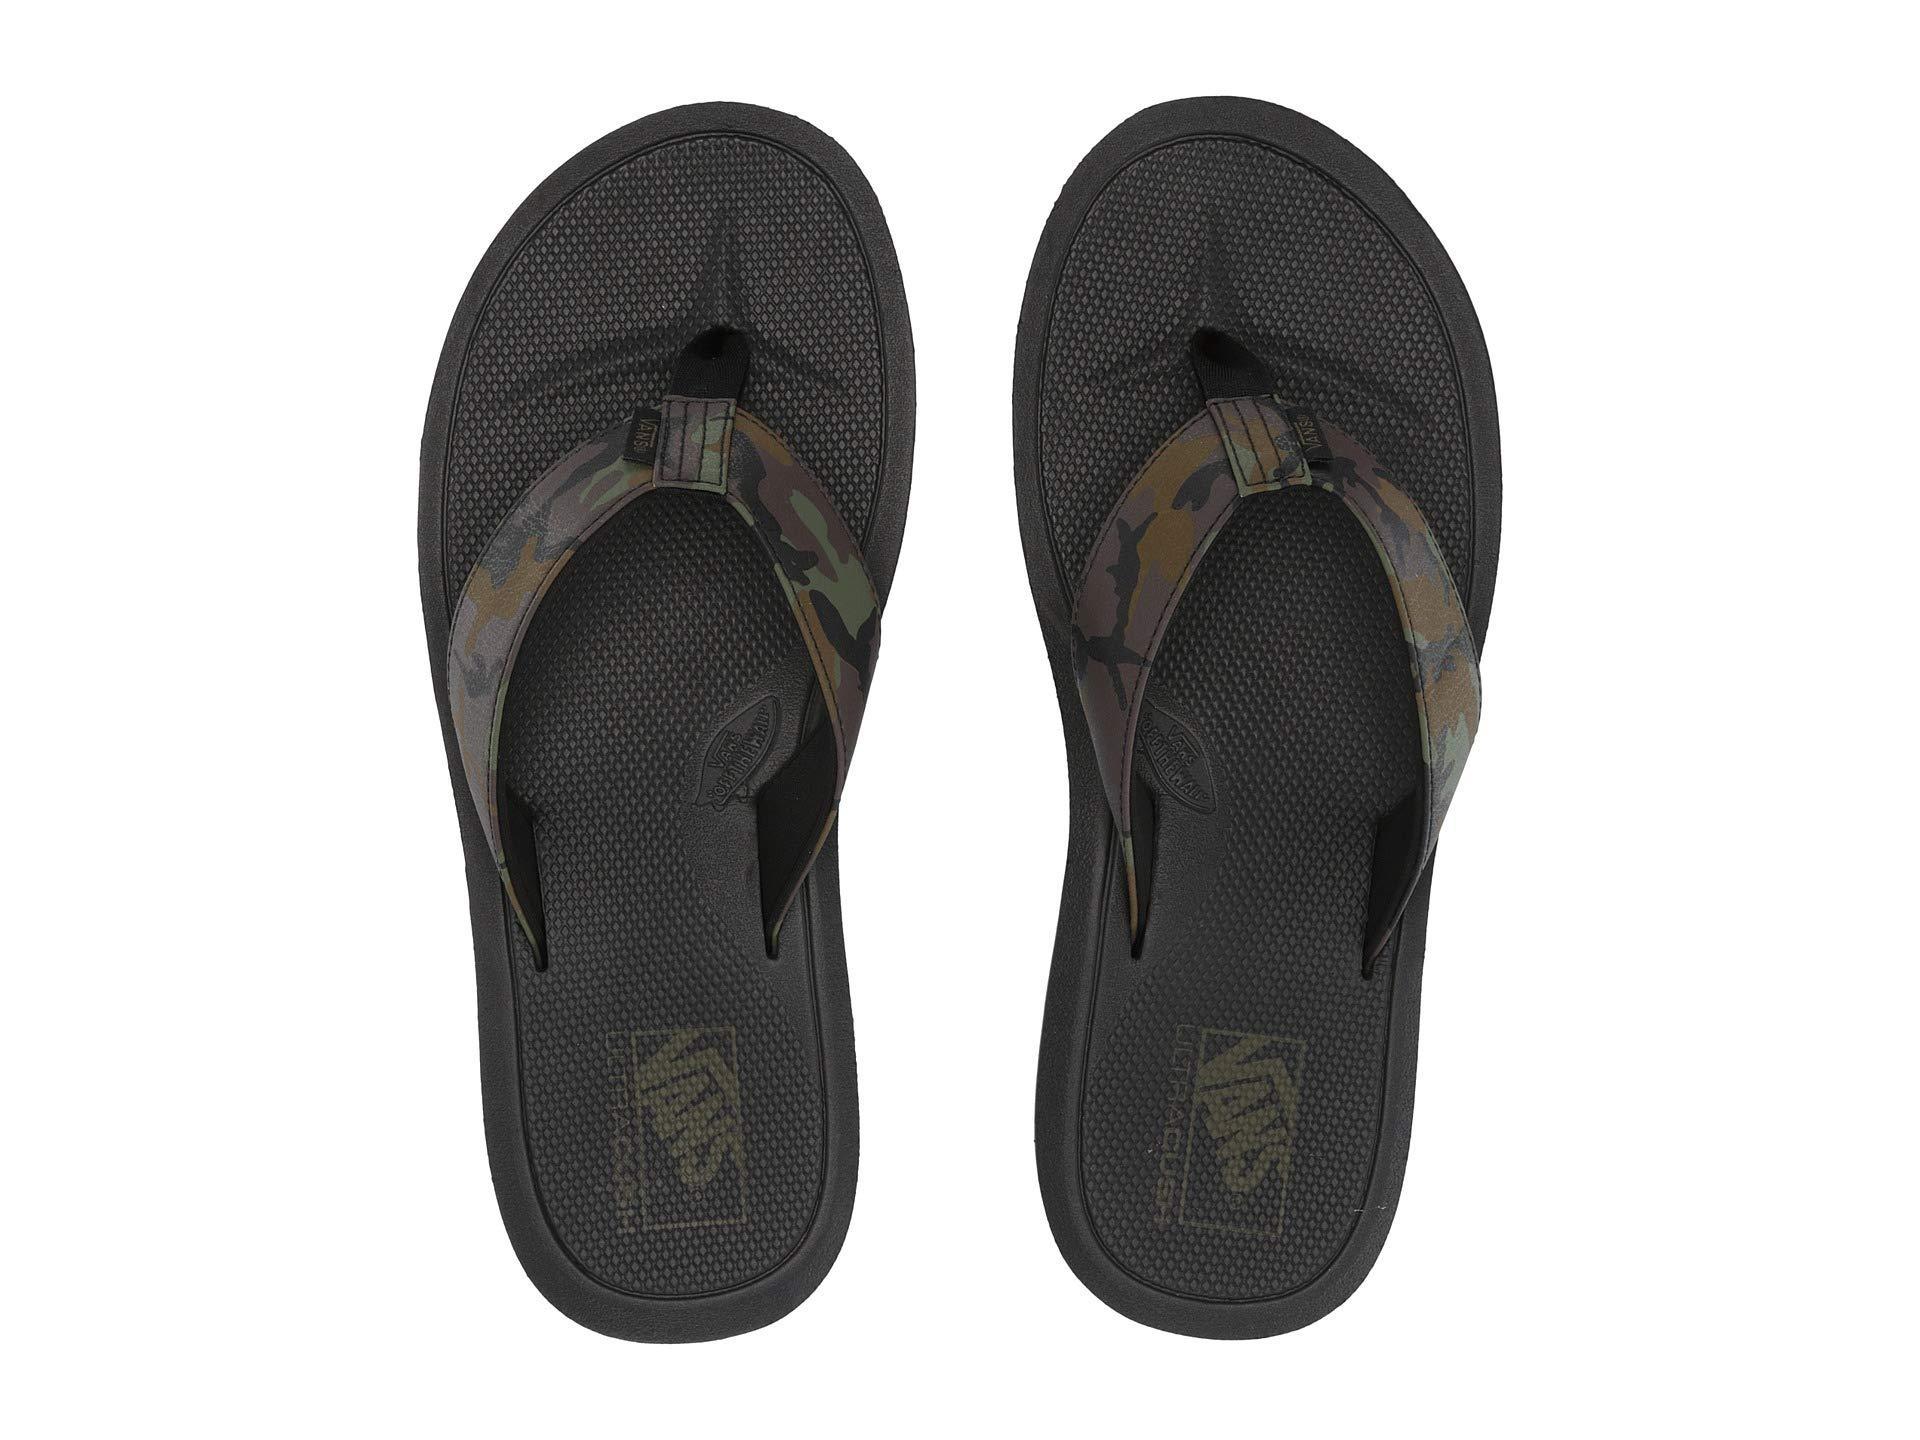 8b05f1bccf7c Lyst - Vans Nexpa Synthetic (black black pewter) Men s Sandals in ...